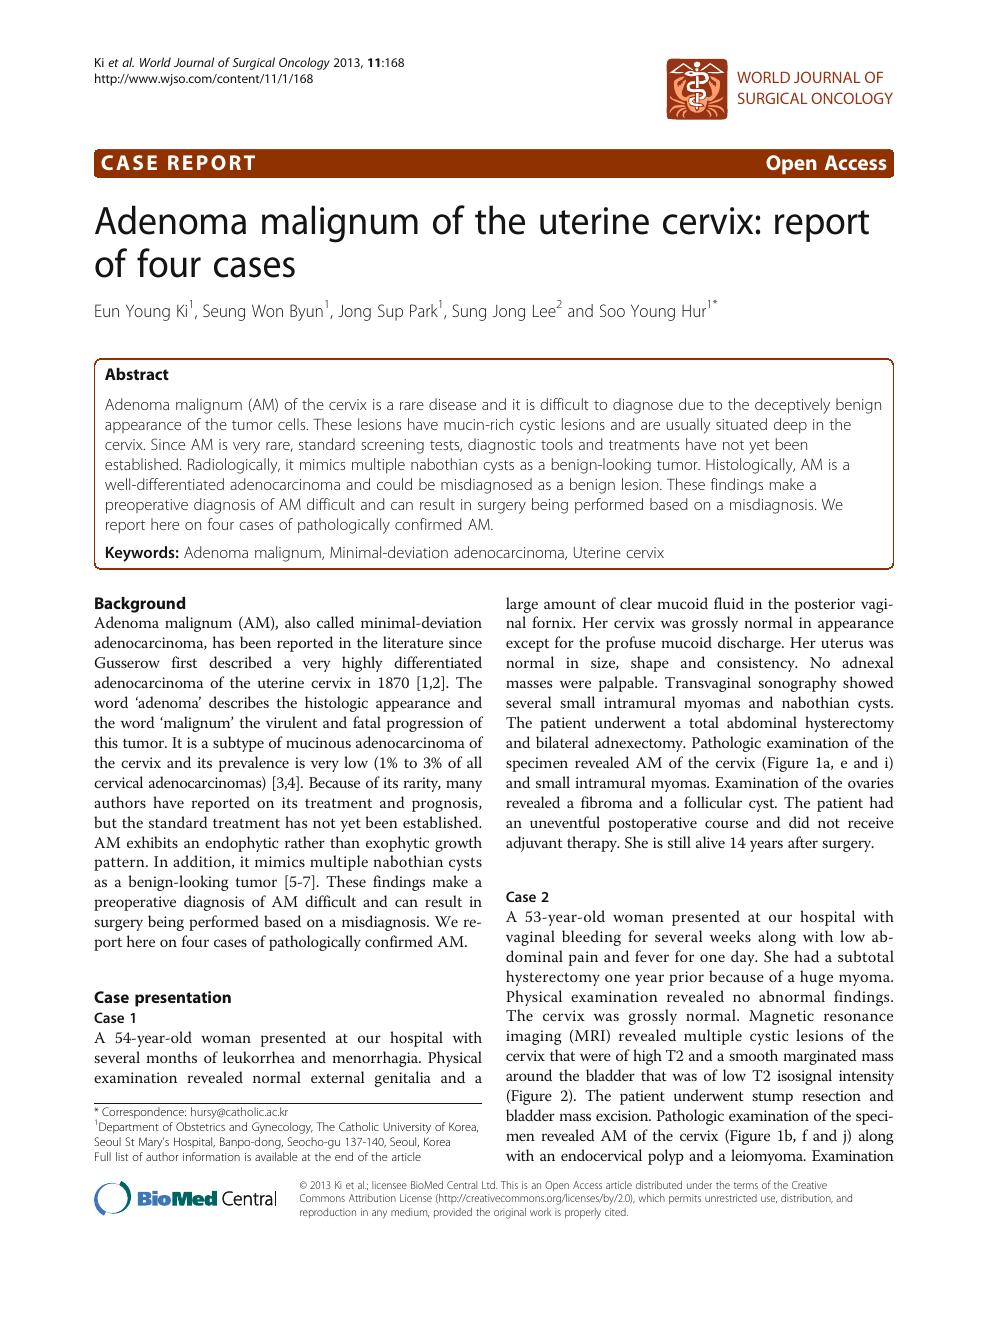 Adenoma malignum of the uterine cervix: report of four cases